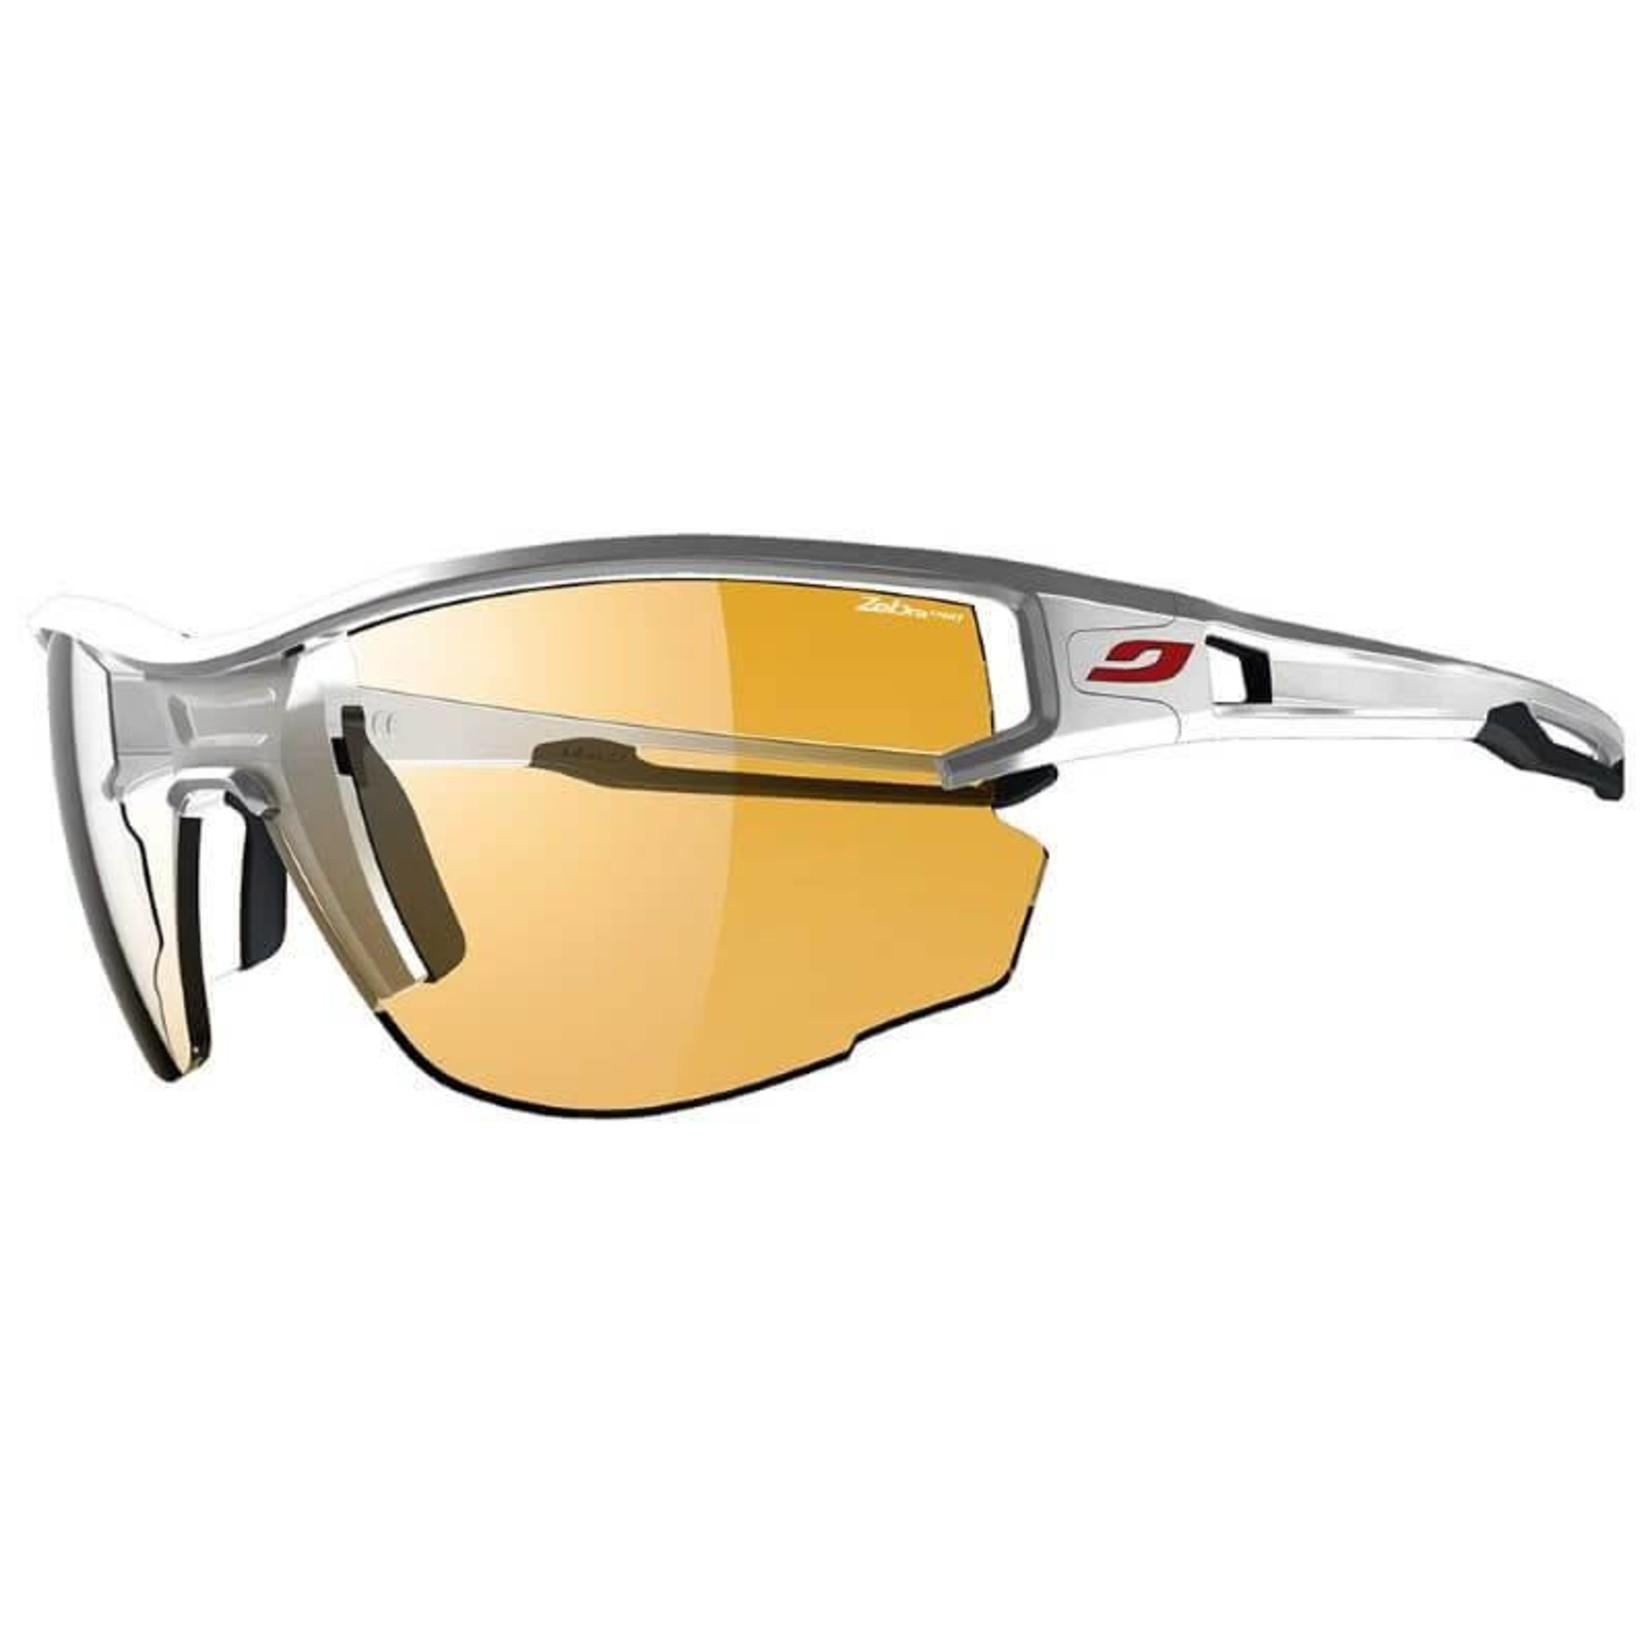 Julbo Julbo Aero Sunglasses - Men